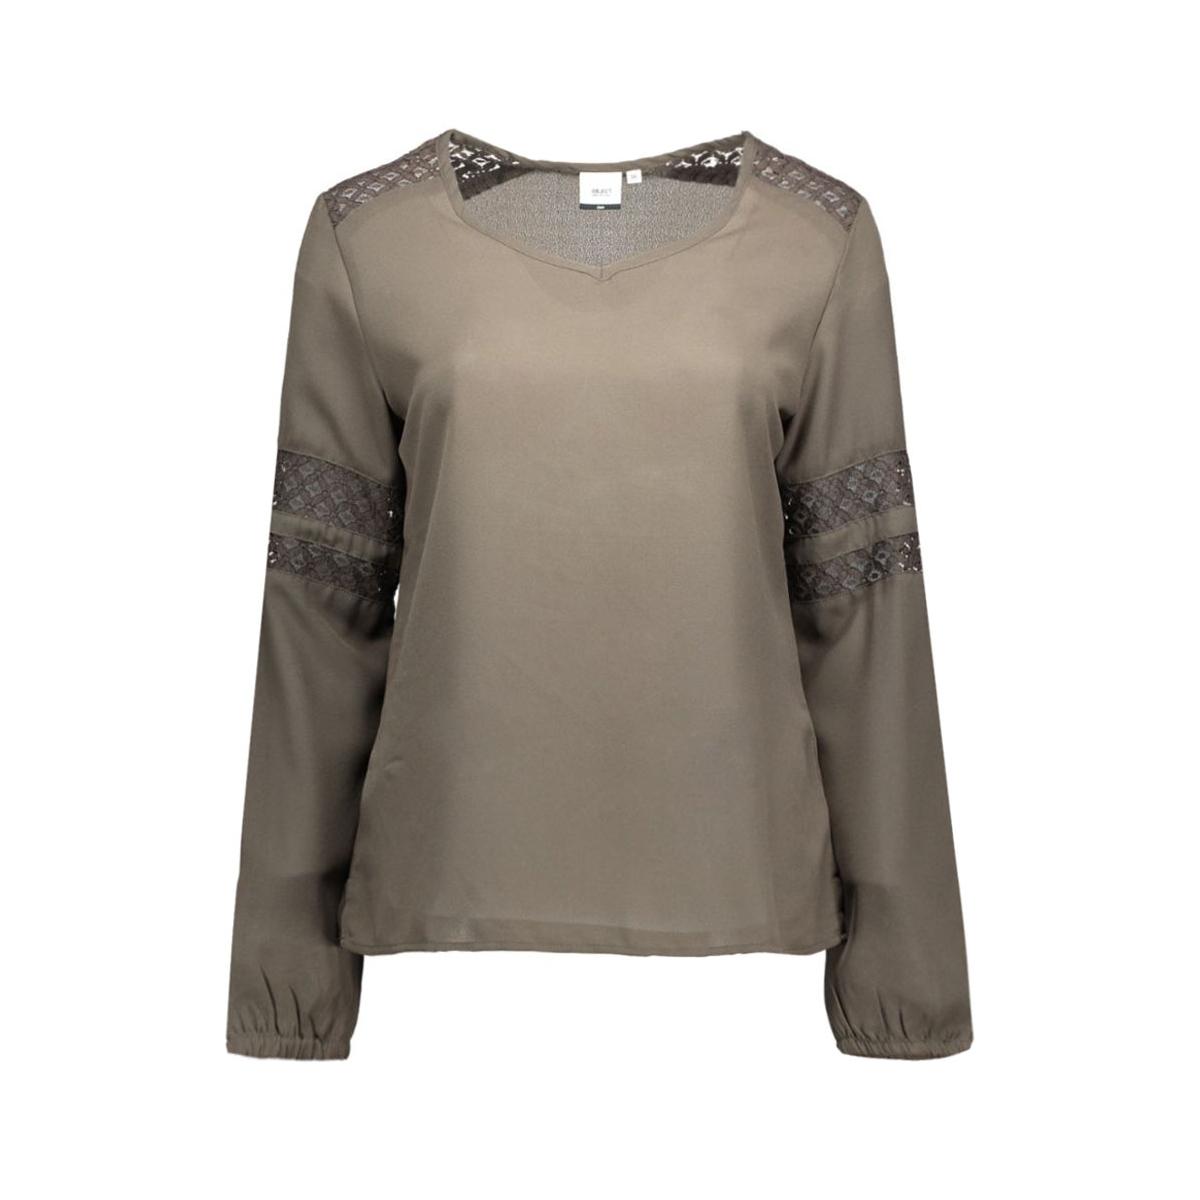 objcasa l/s top 23023149 object blouse beluga